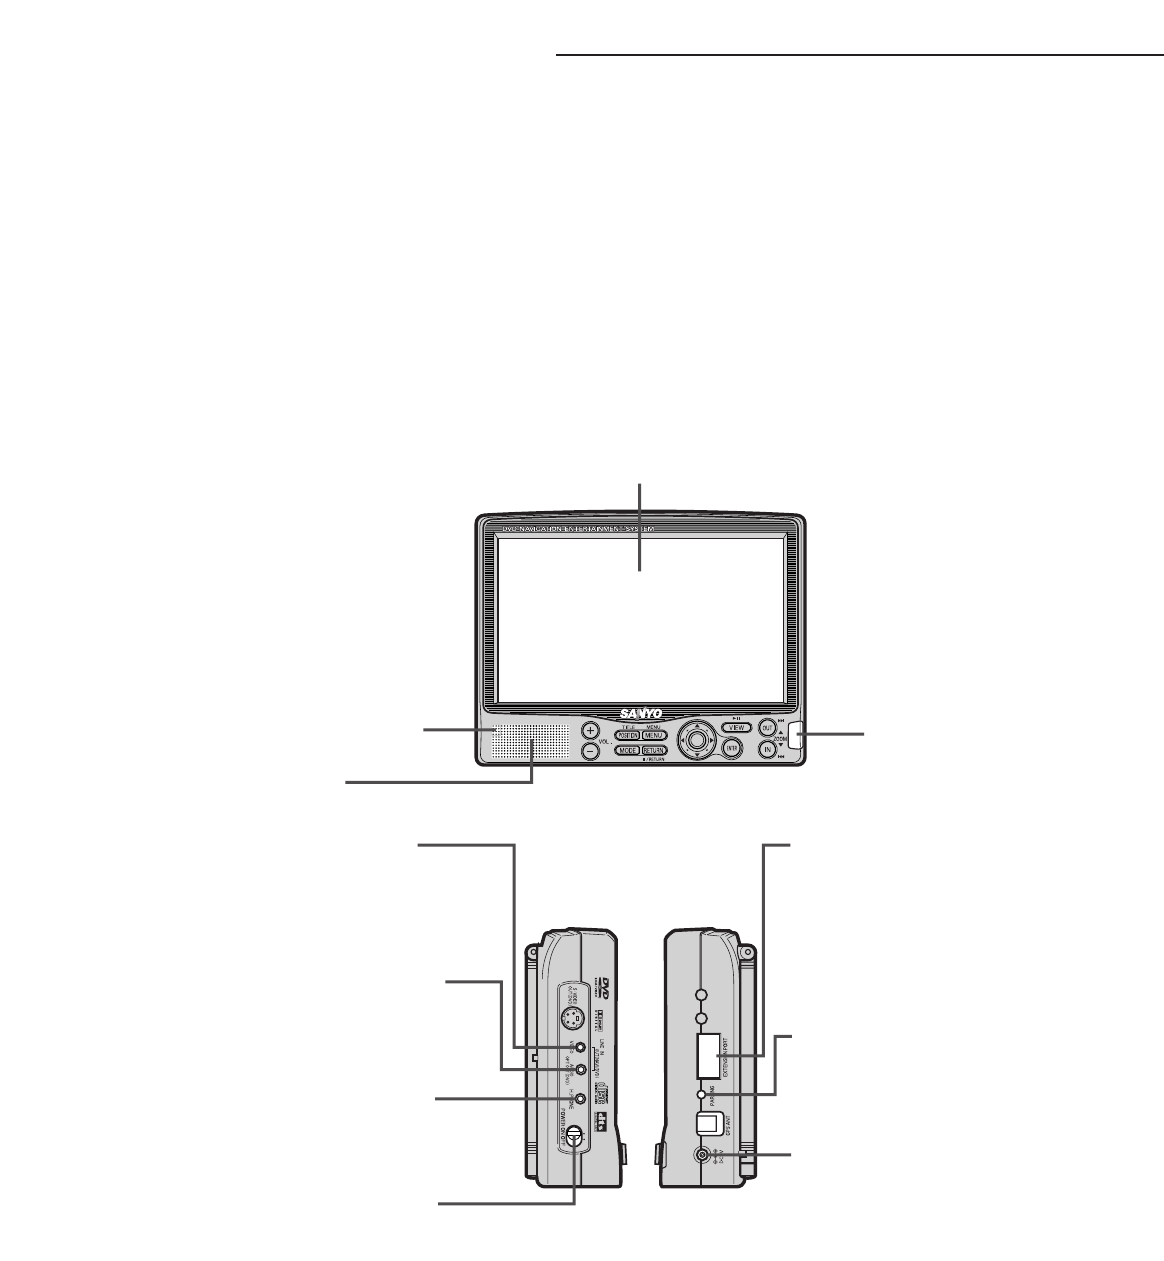 Sanyo Nv E7000 Users Manual SM590496 00_.\1